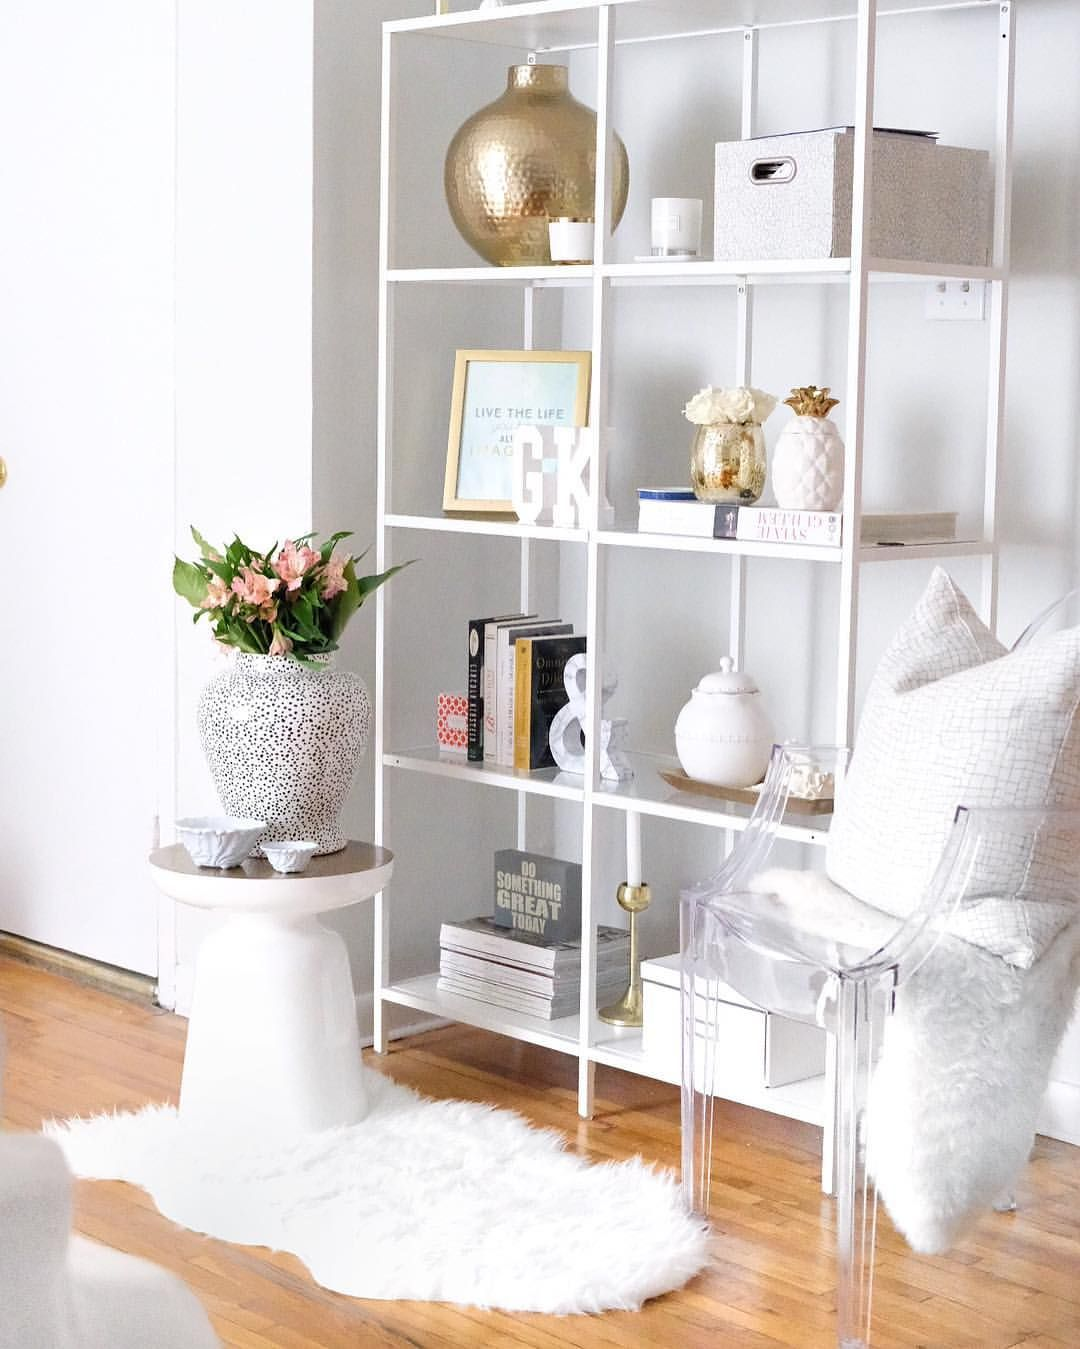 neutral color palette contemporary interior design. Black Bedroom Furniture Sets. Home Design Ideas